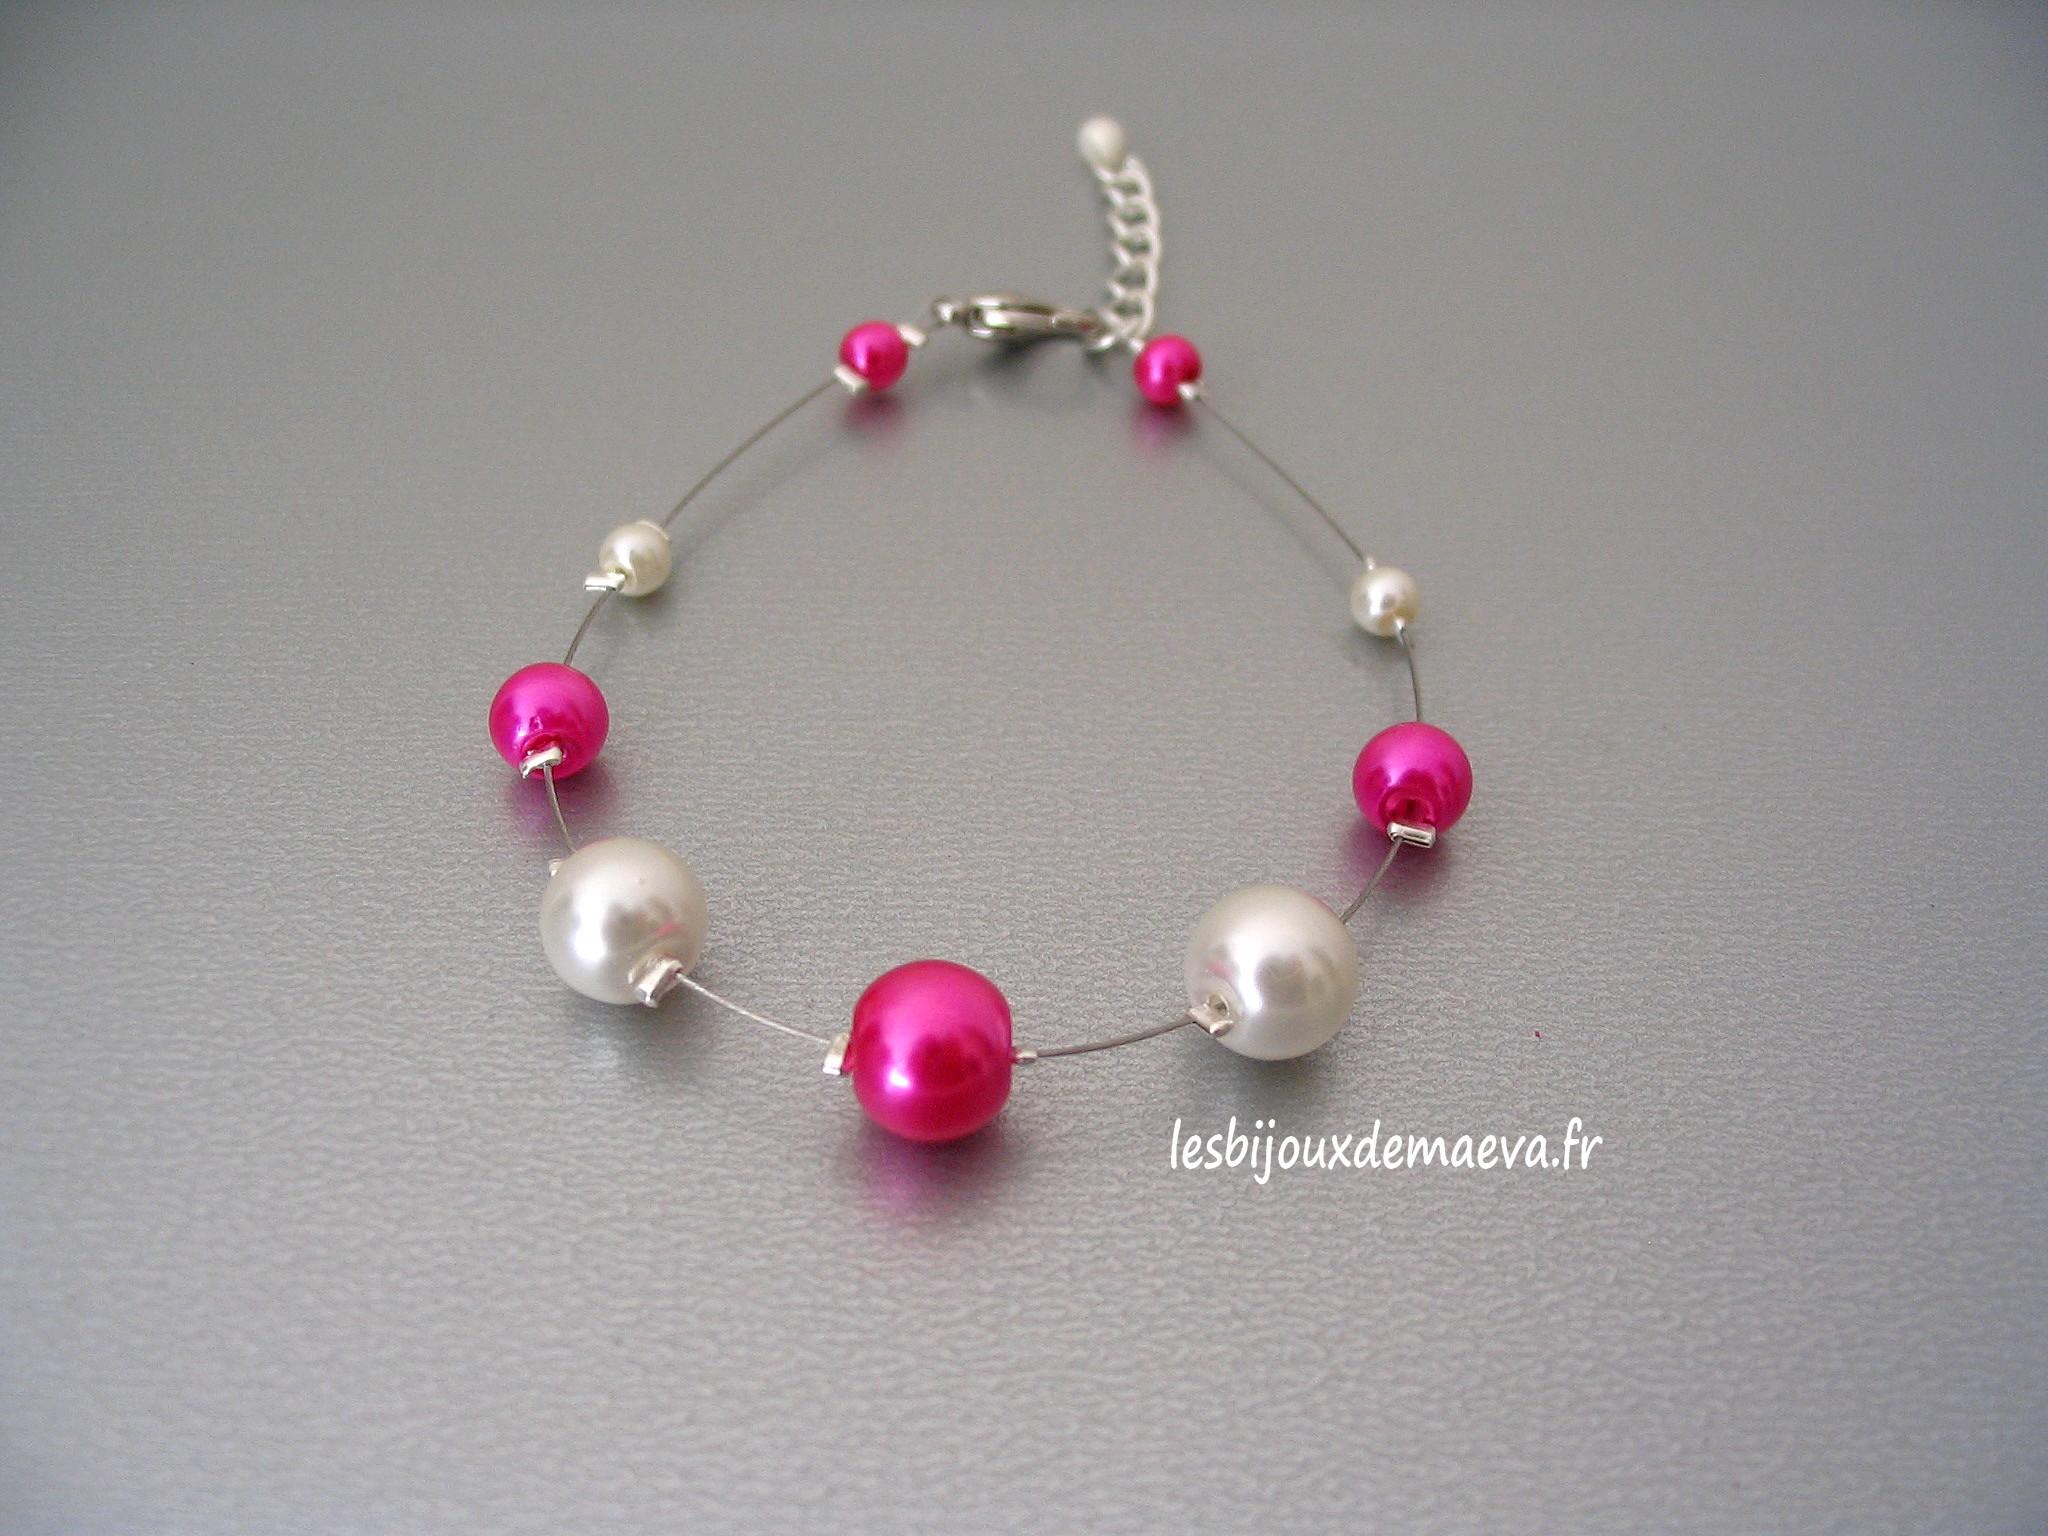 collier de perle fushia